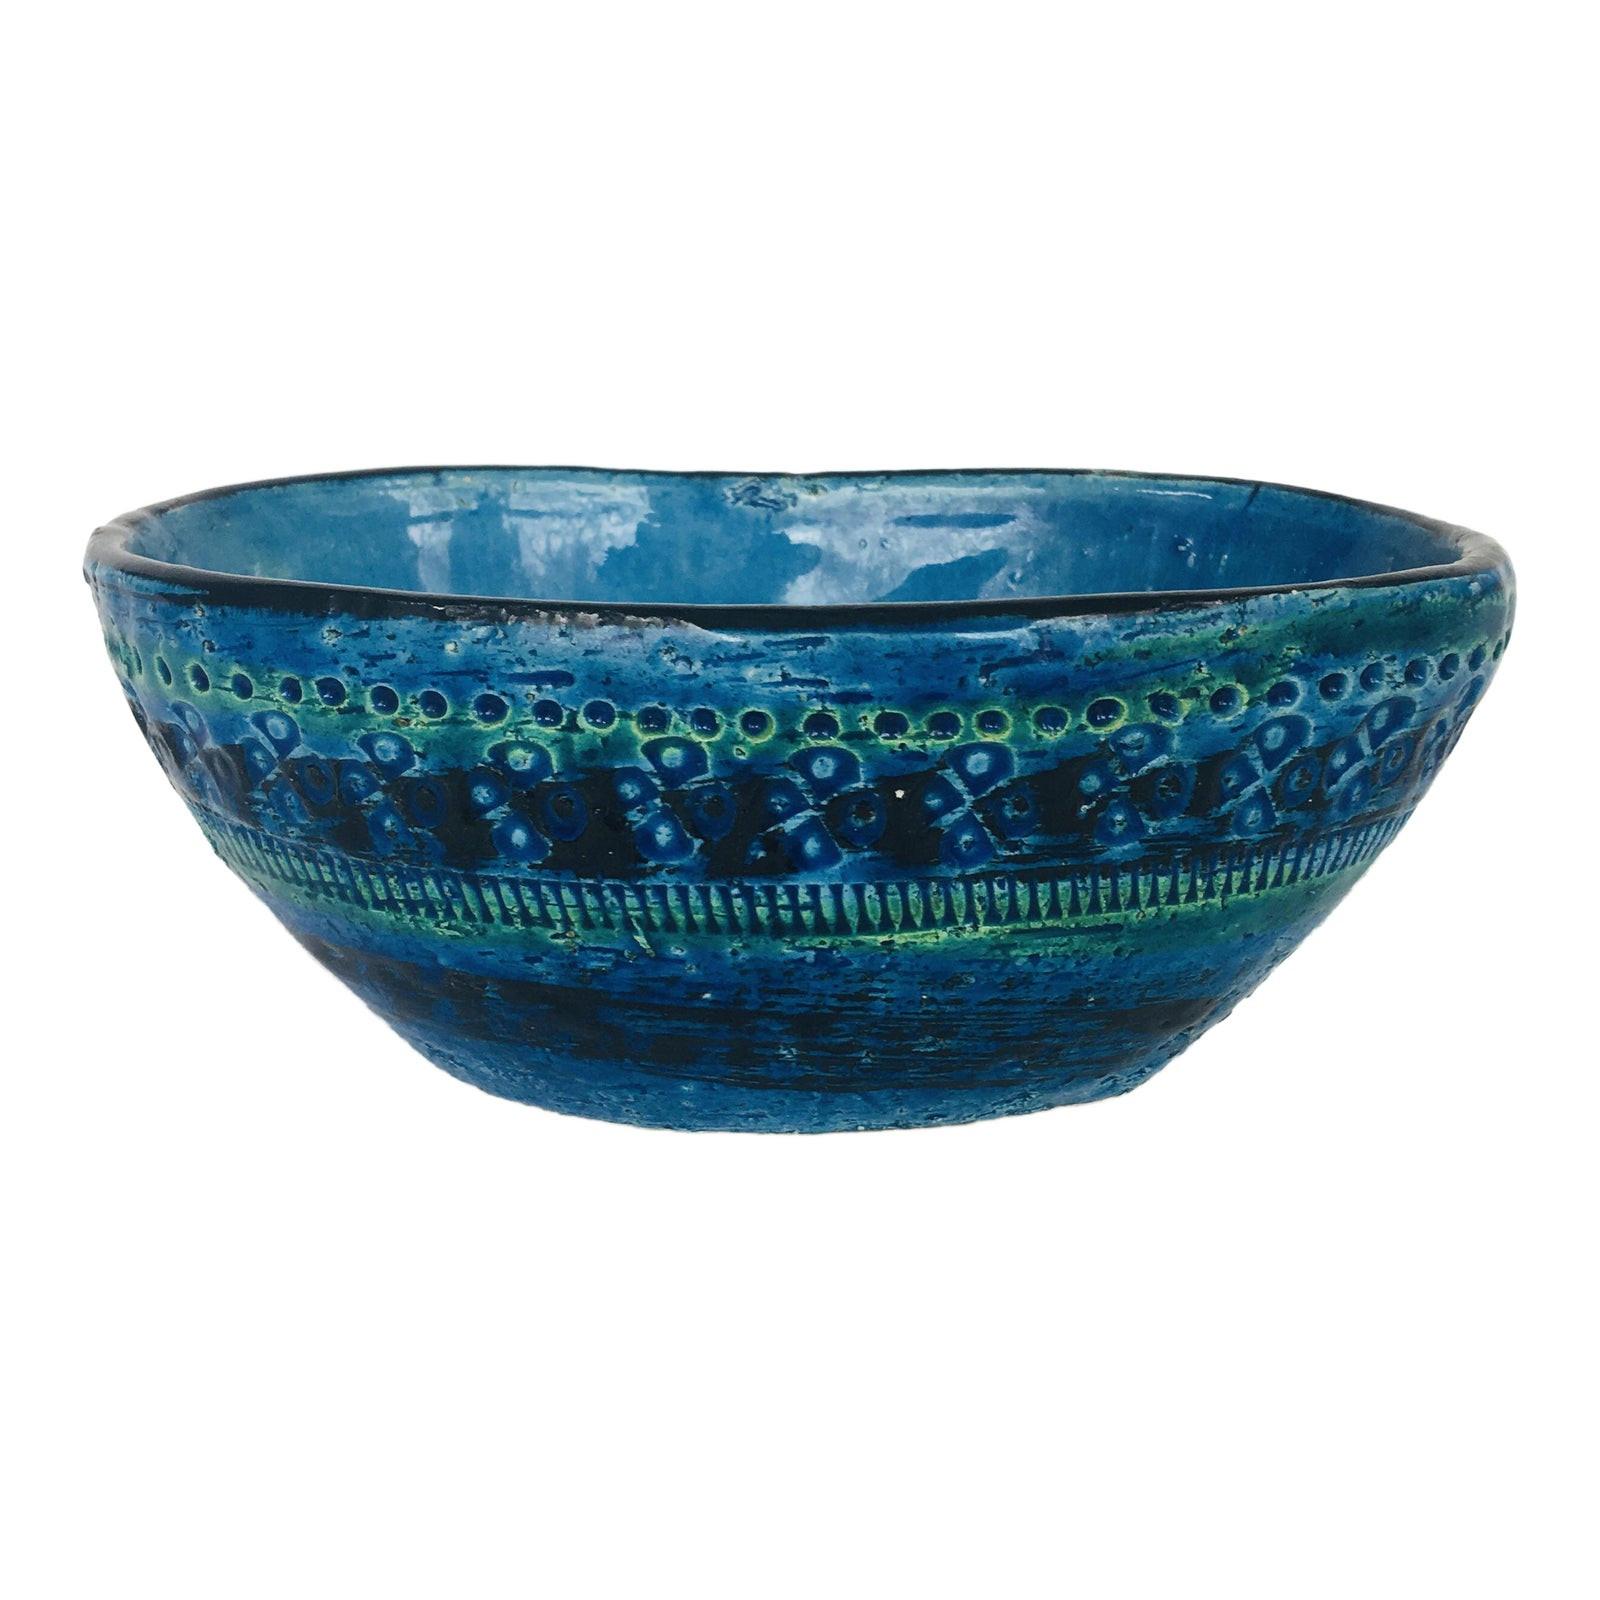 Aldo Londi for Bitossi Rimini Blue Ceramic Bowl